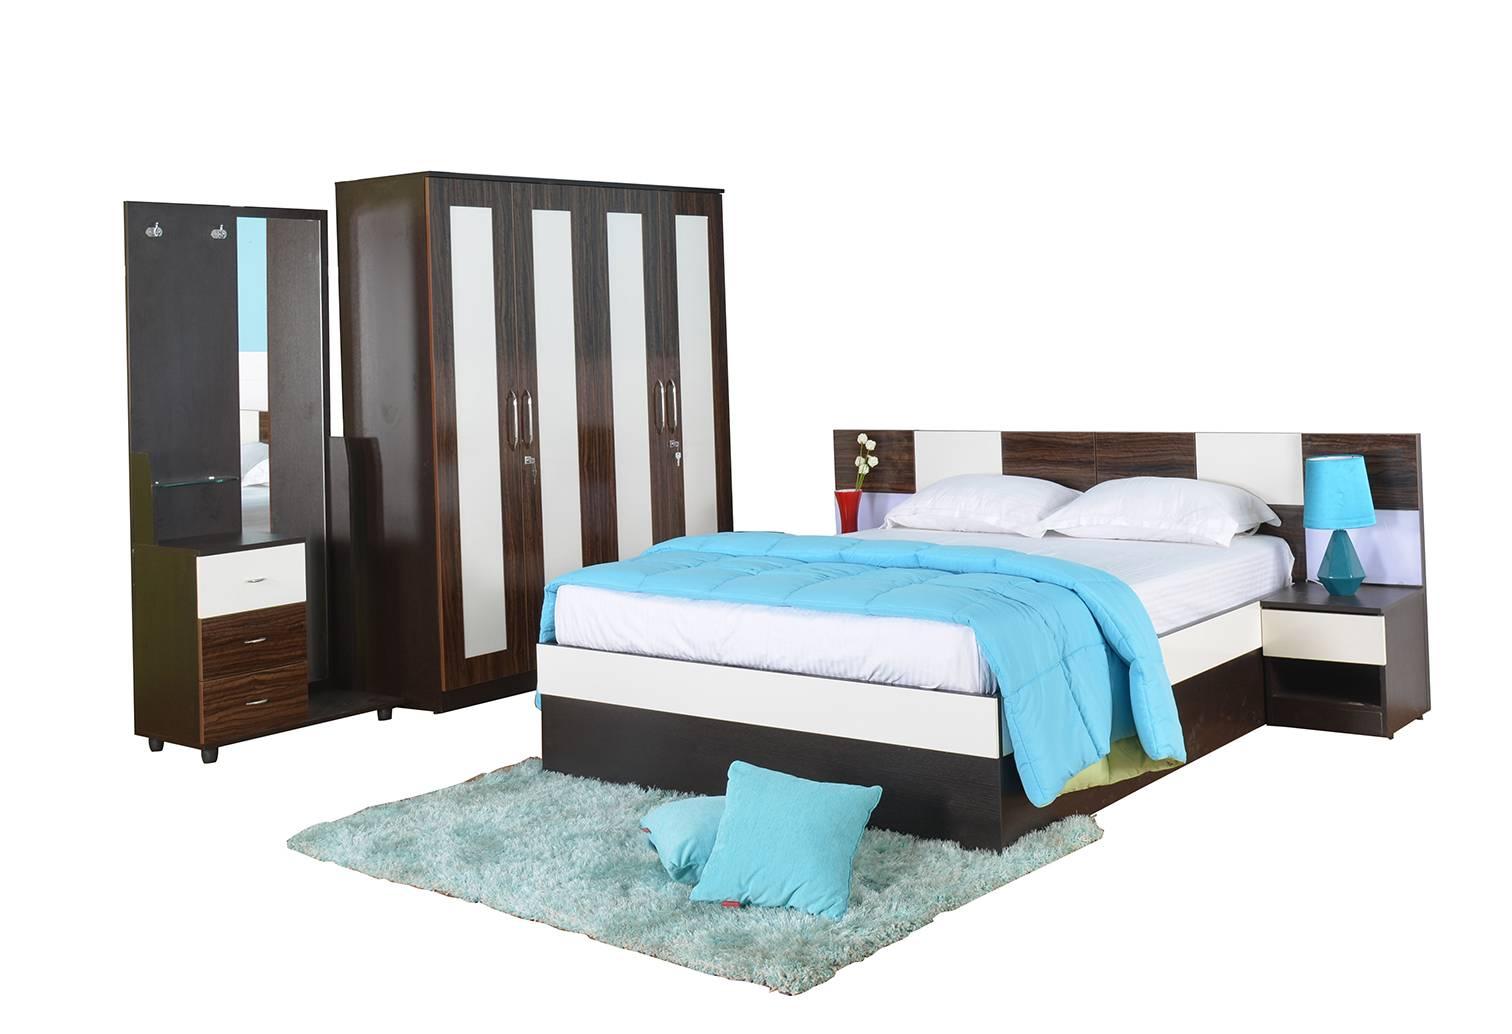 Top 100 Furniture Stores in Haibowal Kalan, Ludhiana